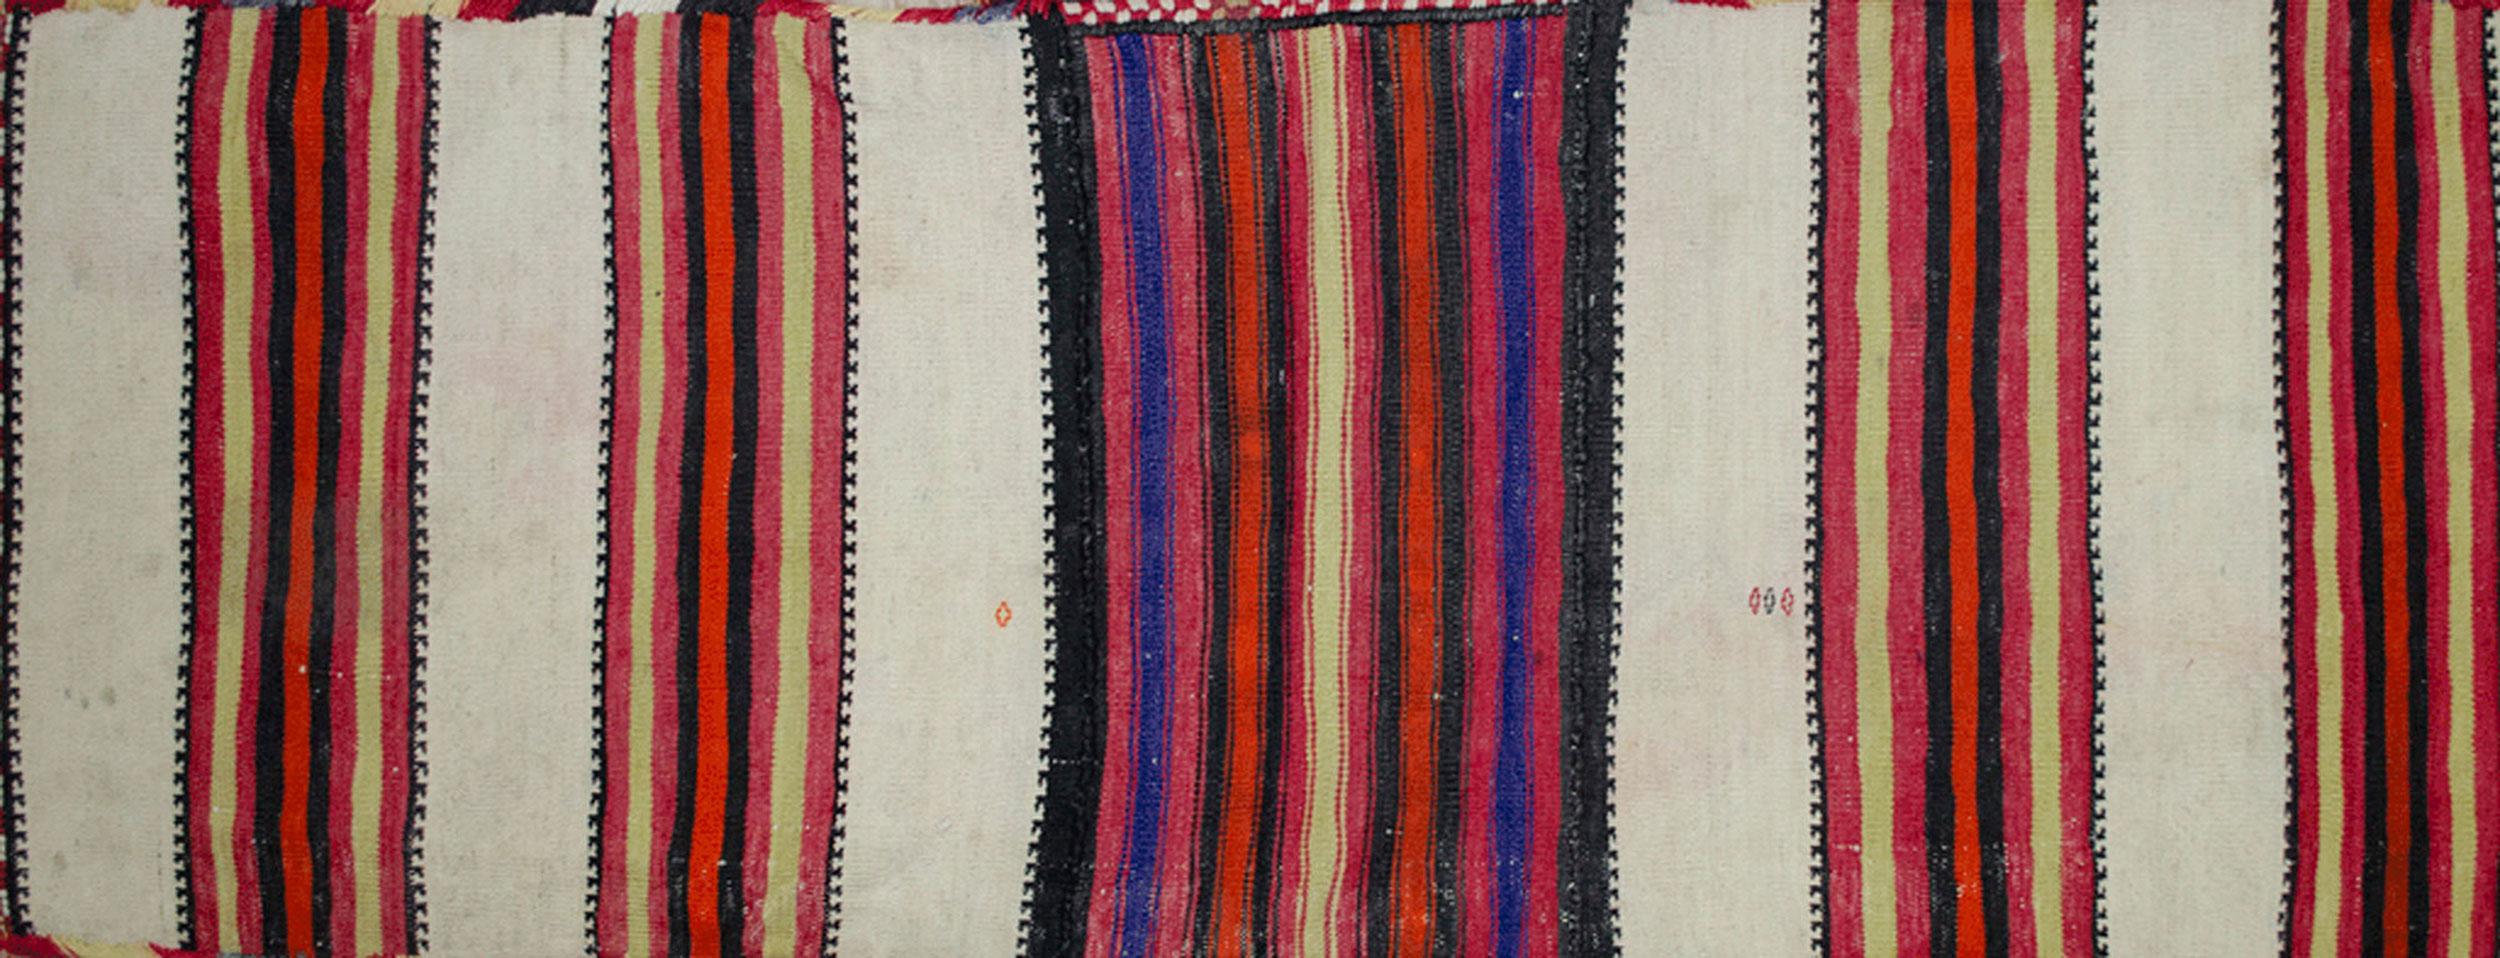 Vintage Kelat Bag 152x57cm